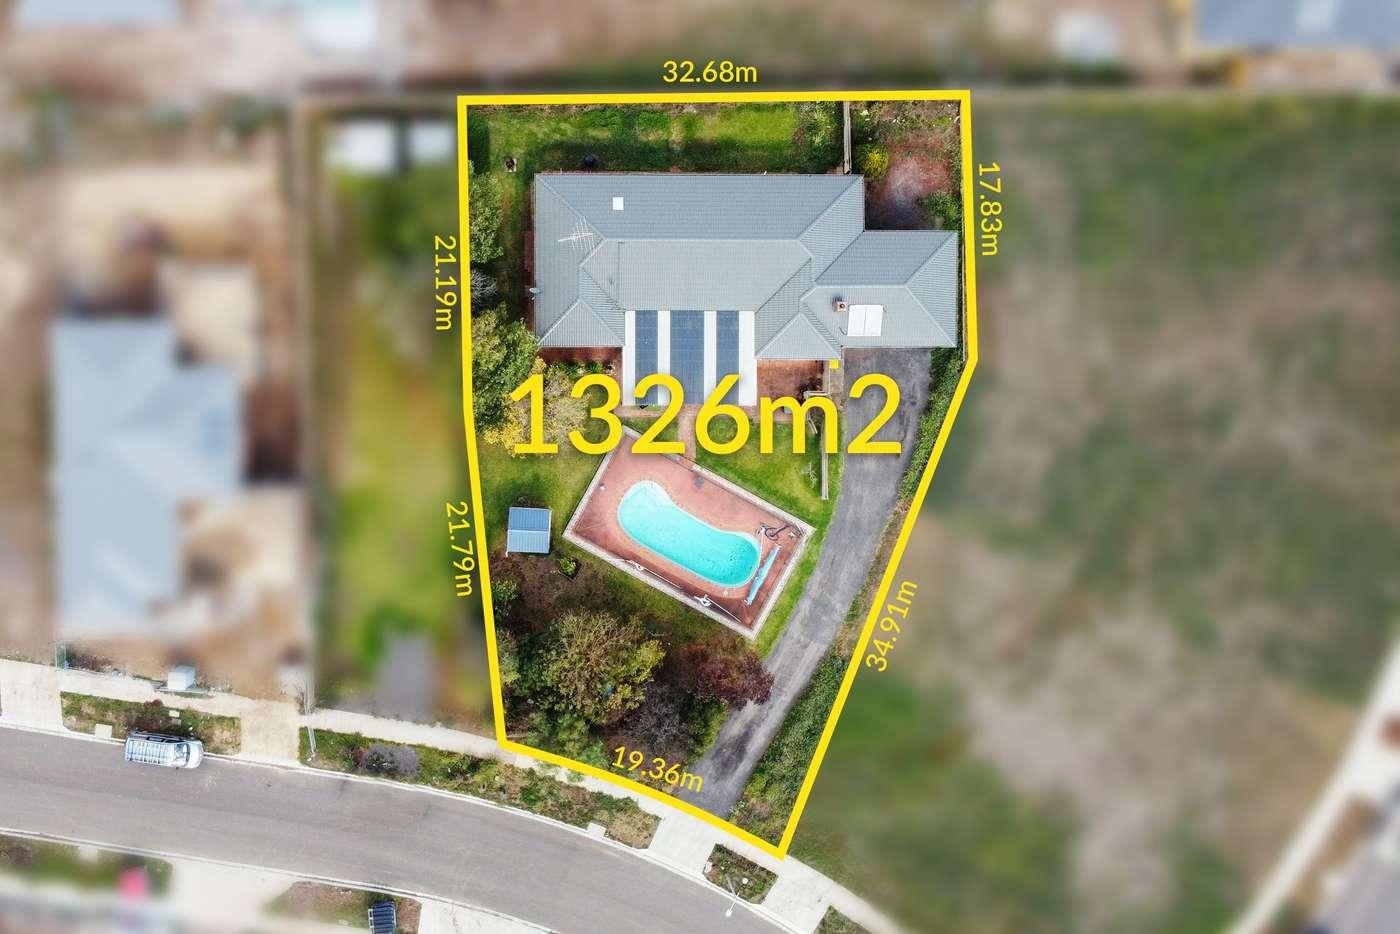 Main view of Homely house listing, 4 Blackwood Road, Lara VIC 3212